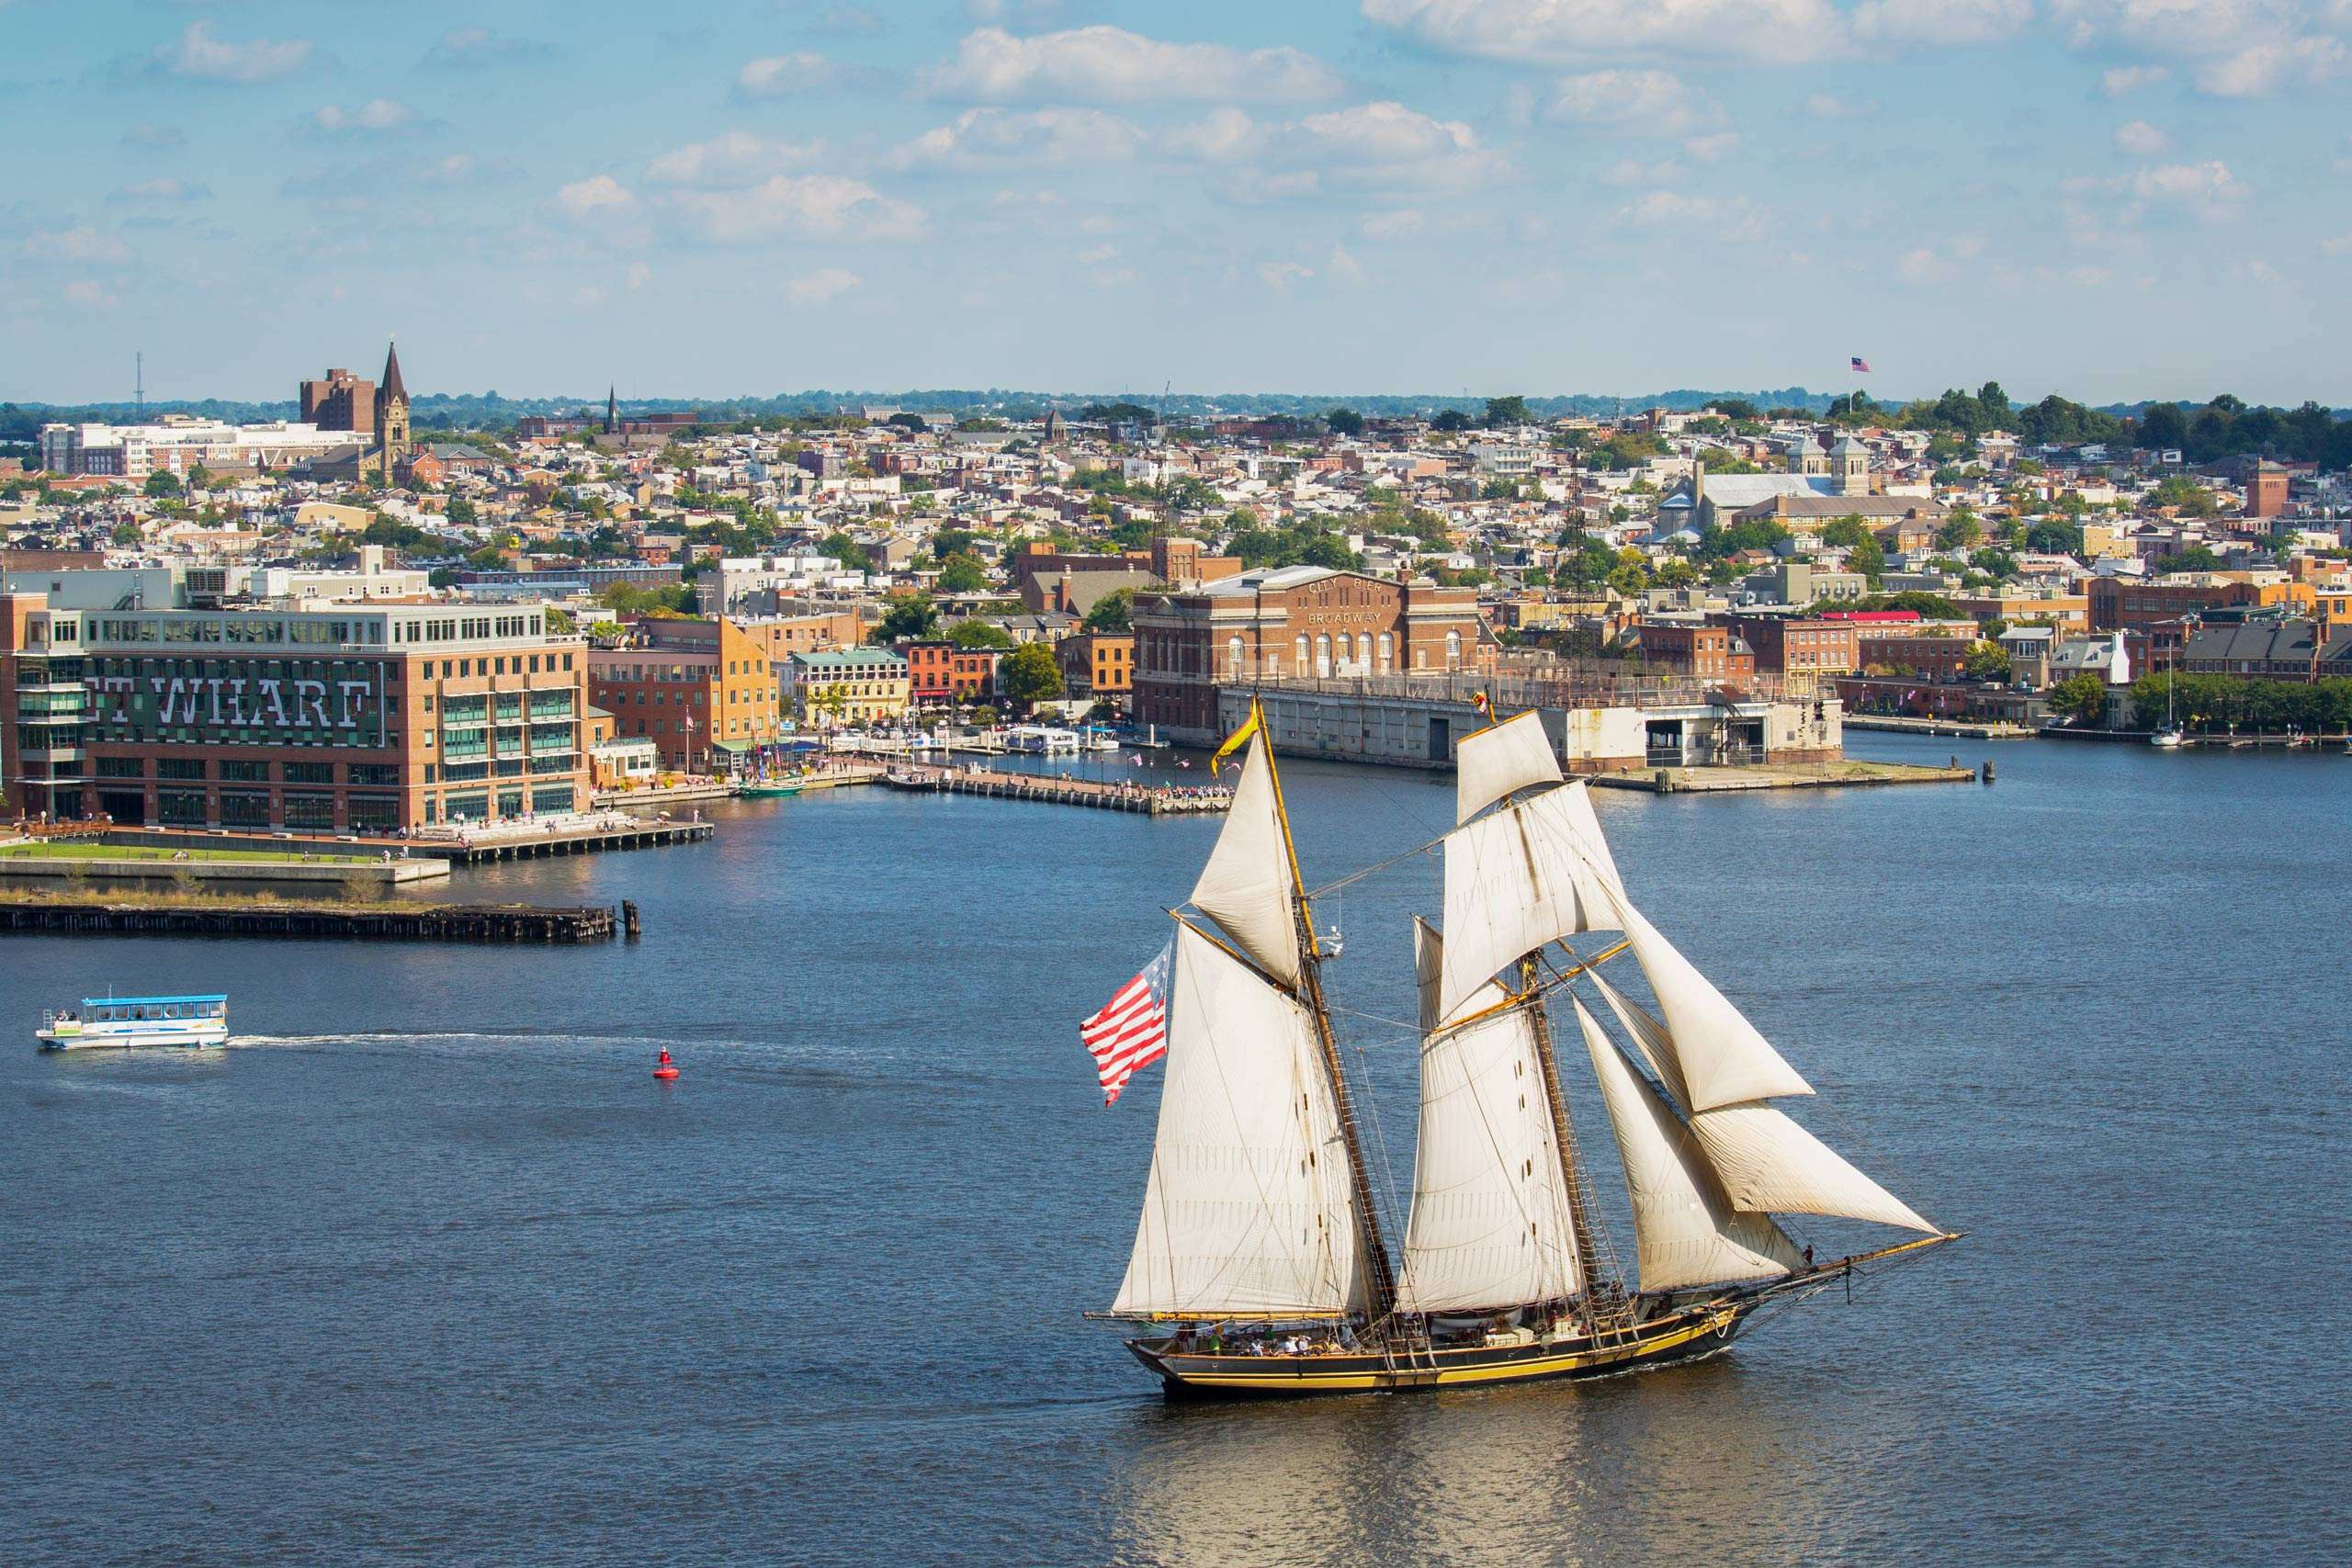 PORTFOLIO - Baltimore - Neighborhoods    #24   Pride of Baltimore II sailing by Fells Point.